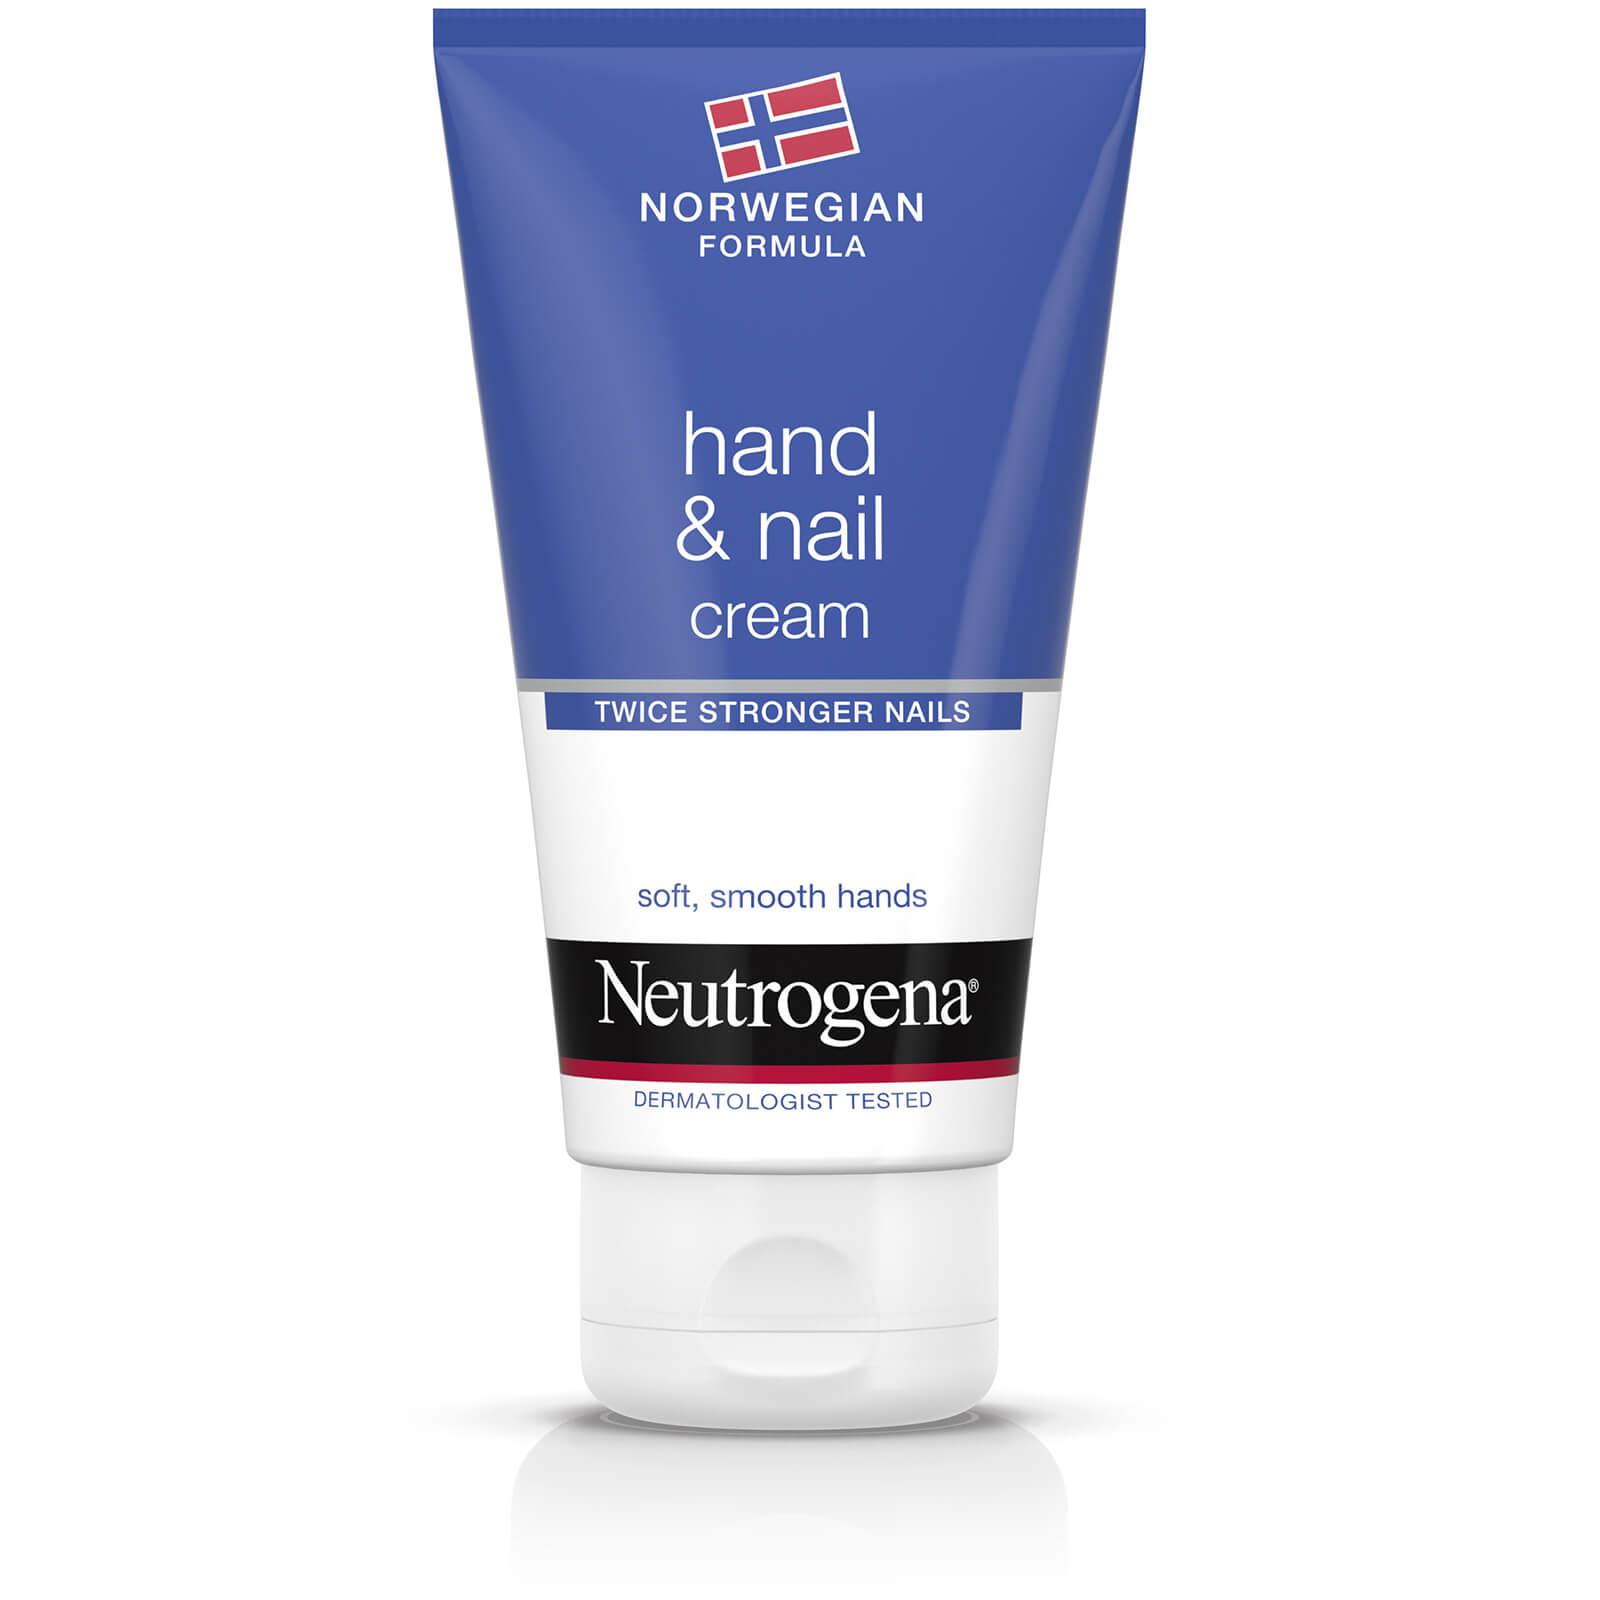 Купить Neutrogena Norwegian Formula Hand and Nail Cream 75ml